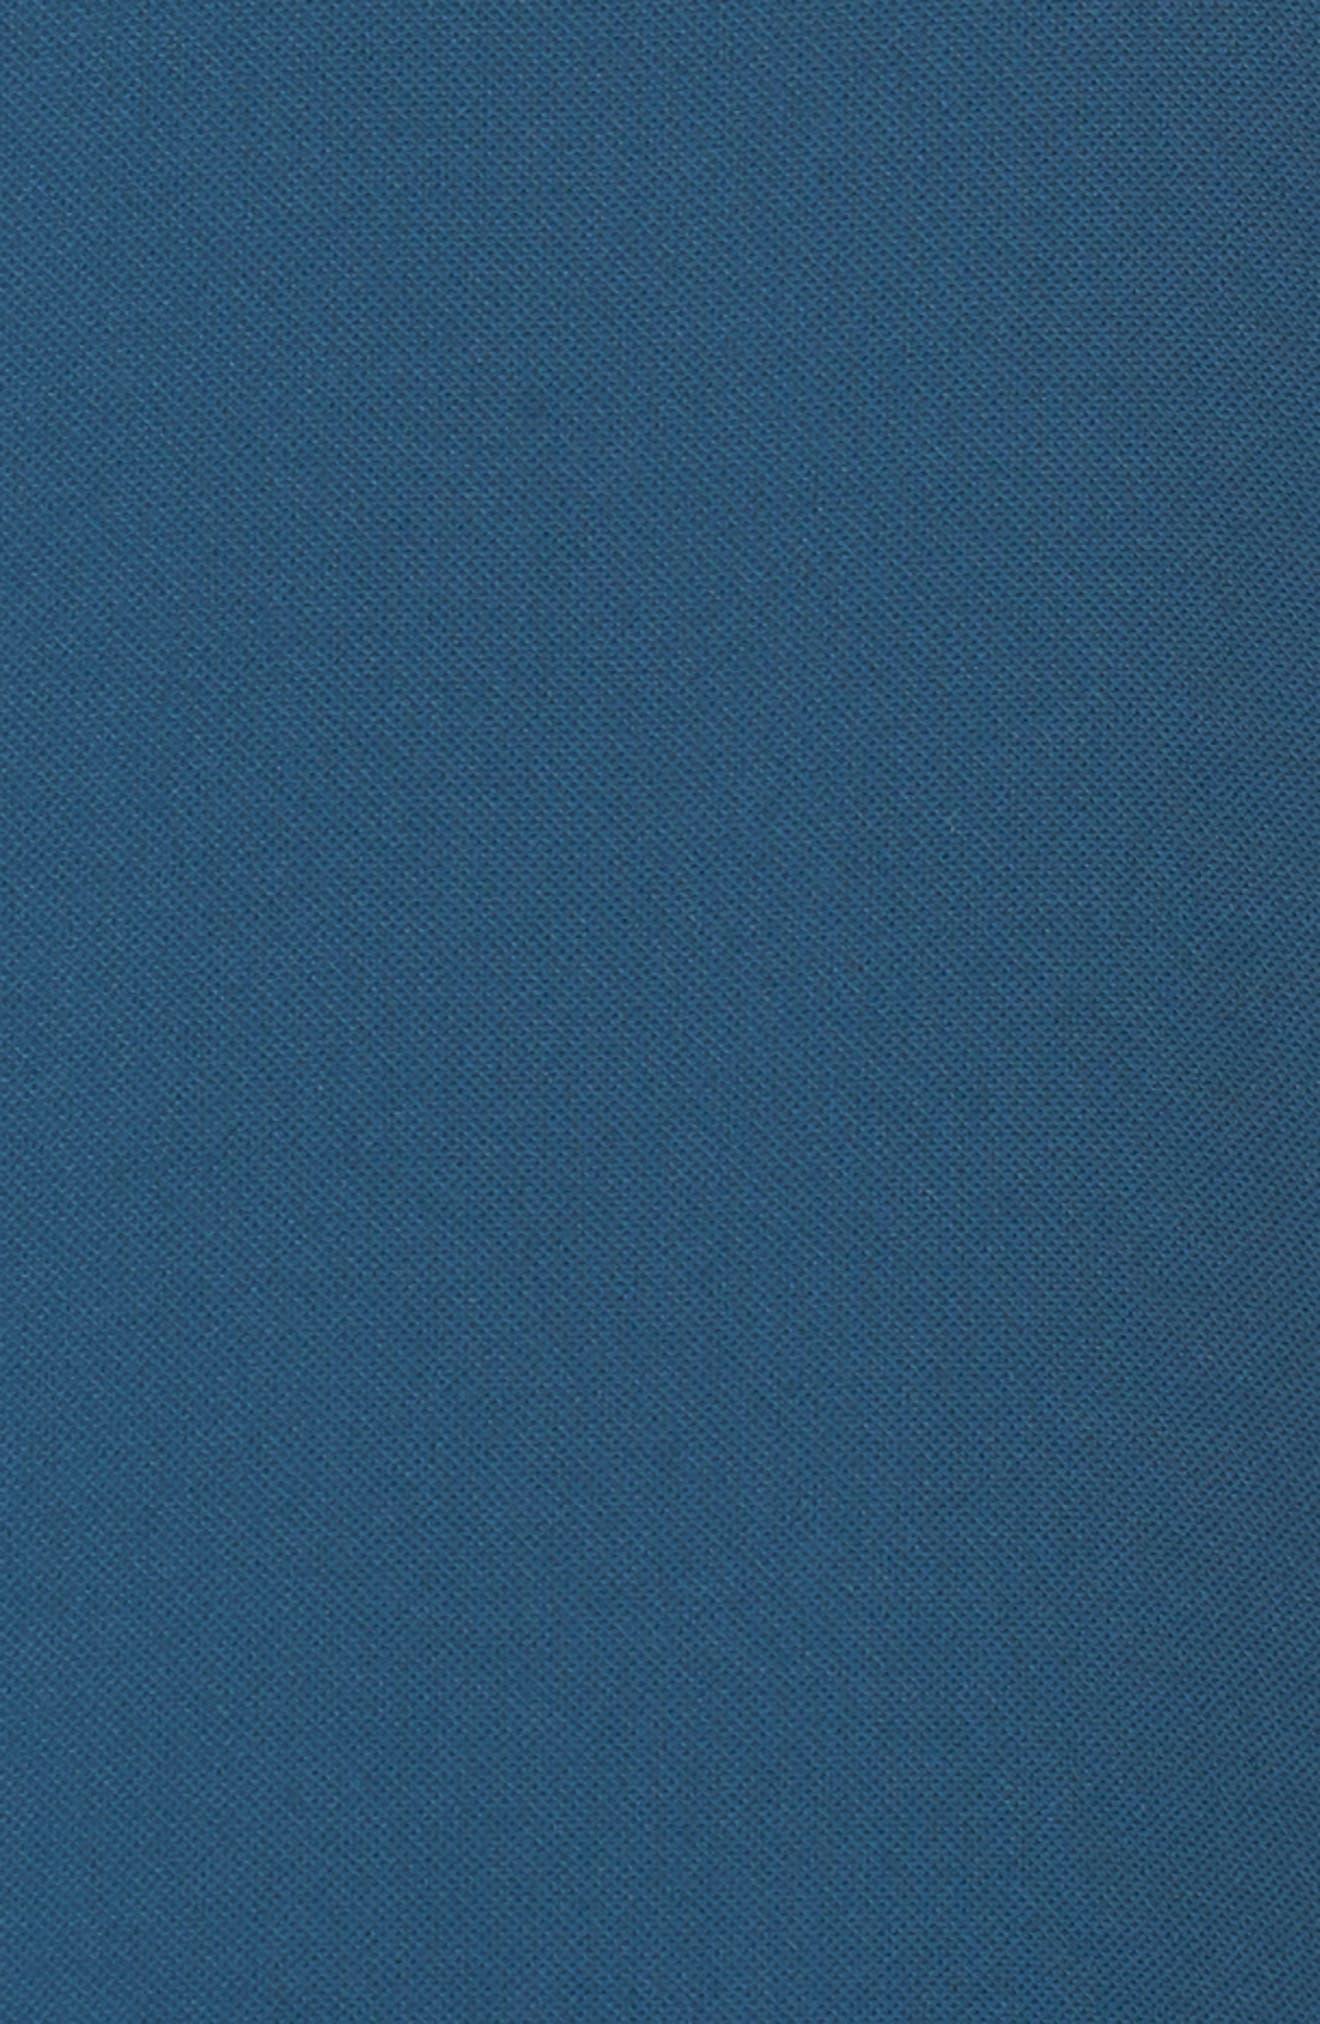 Gauzy One-Shoulder Crepe Dress,                             Alternate thumbnail 3, color,                             Midnight Jungle